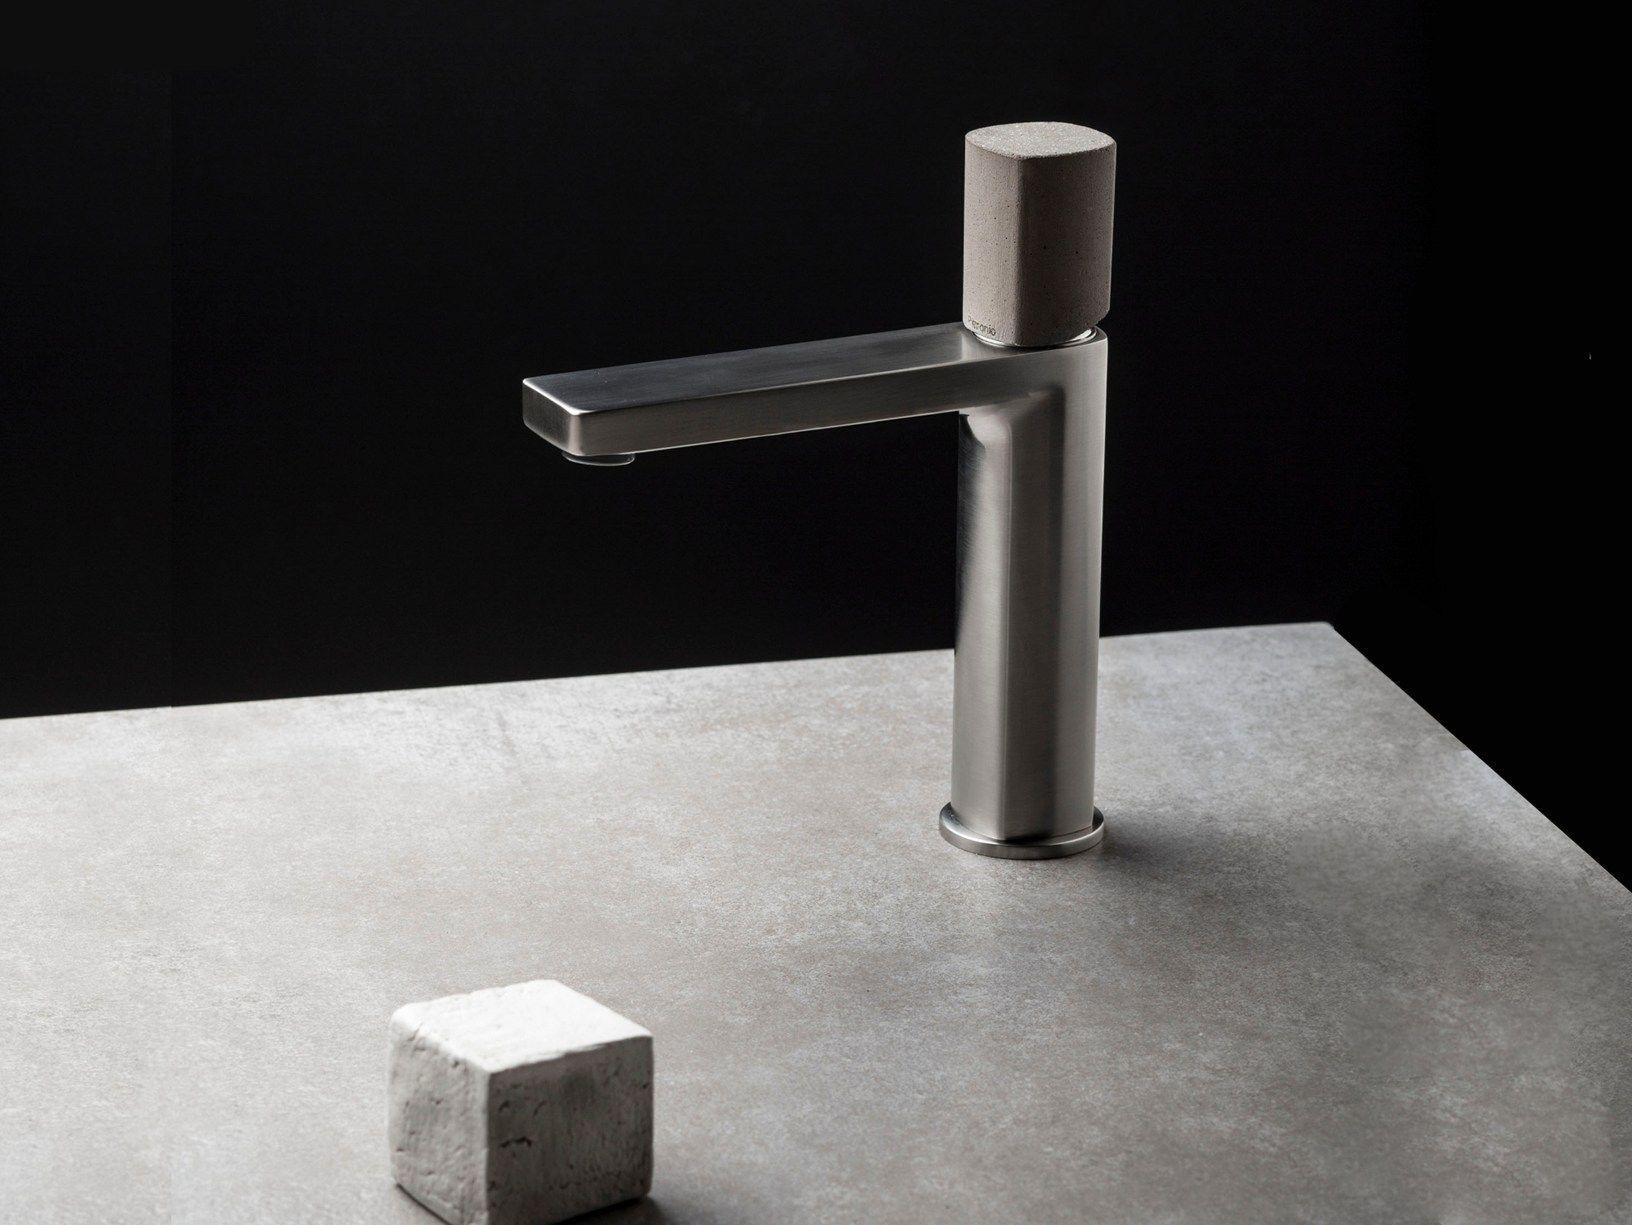 Piscine En Inox Steel And Style concrete becomes decorative element